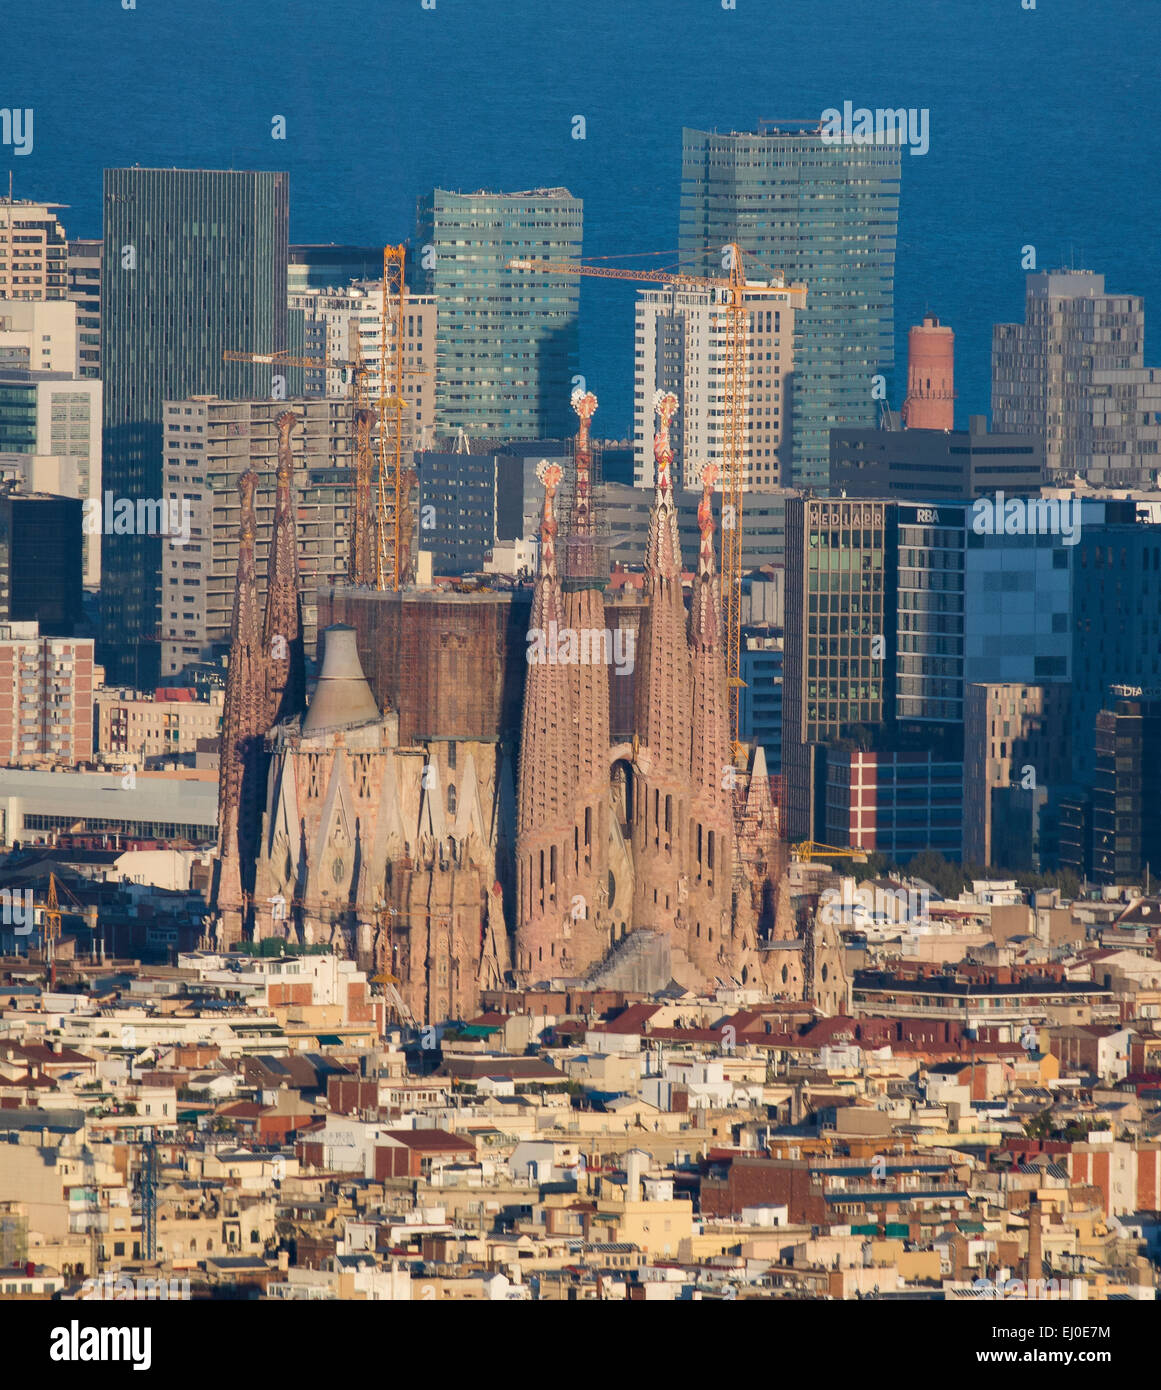 Barcelona, ciudad, paisaje urbano, la Sagrada Familia, la iglesia, España, Europa, antena, Agbar, arquitectura, Imagen De Stock